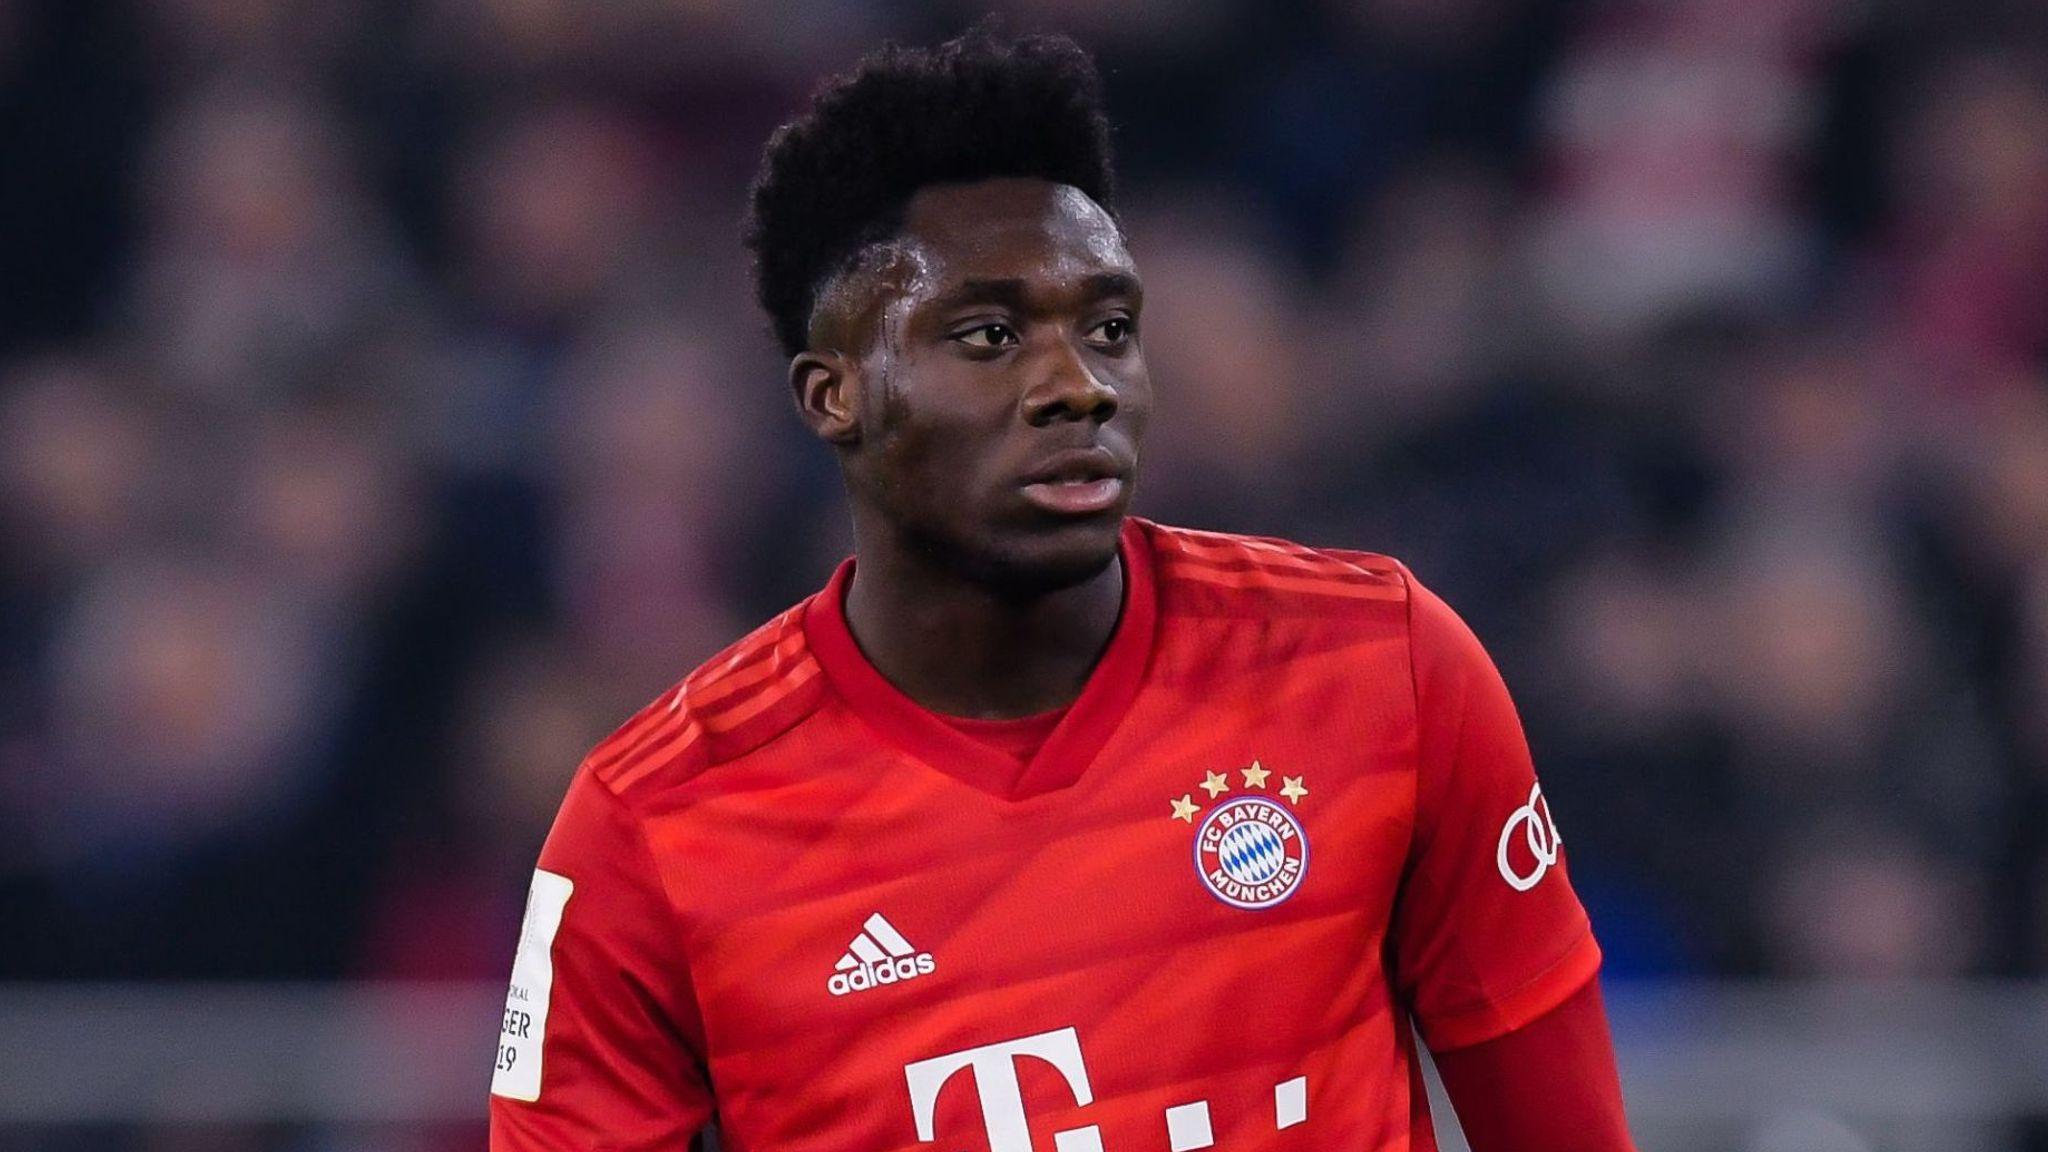 Alphonso Davies: From refugee fleeing war and starvation to Bayern Munich  star | Football News | Sky Sports